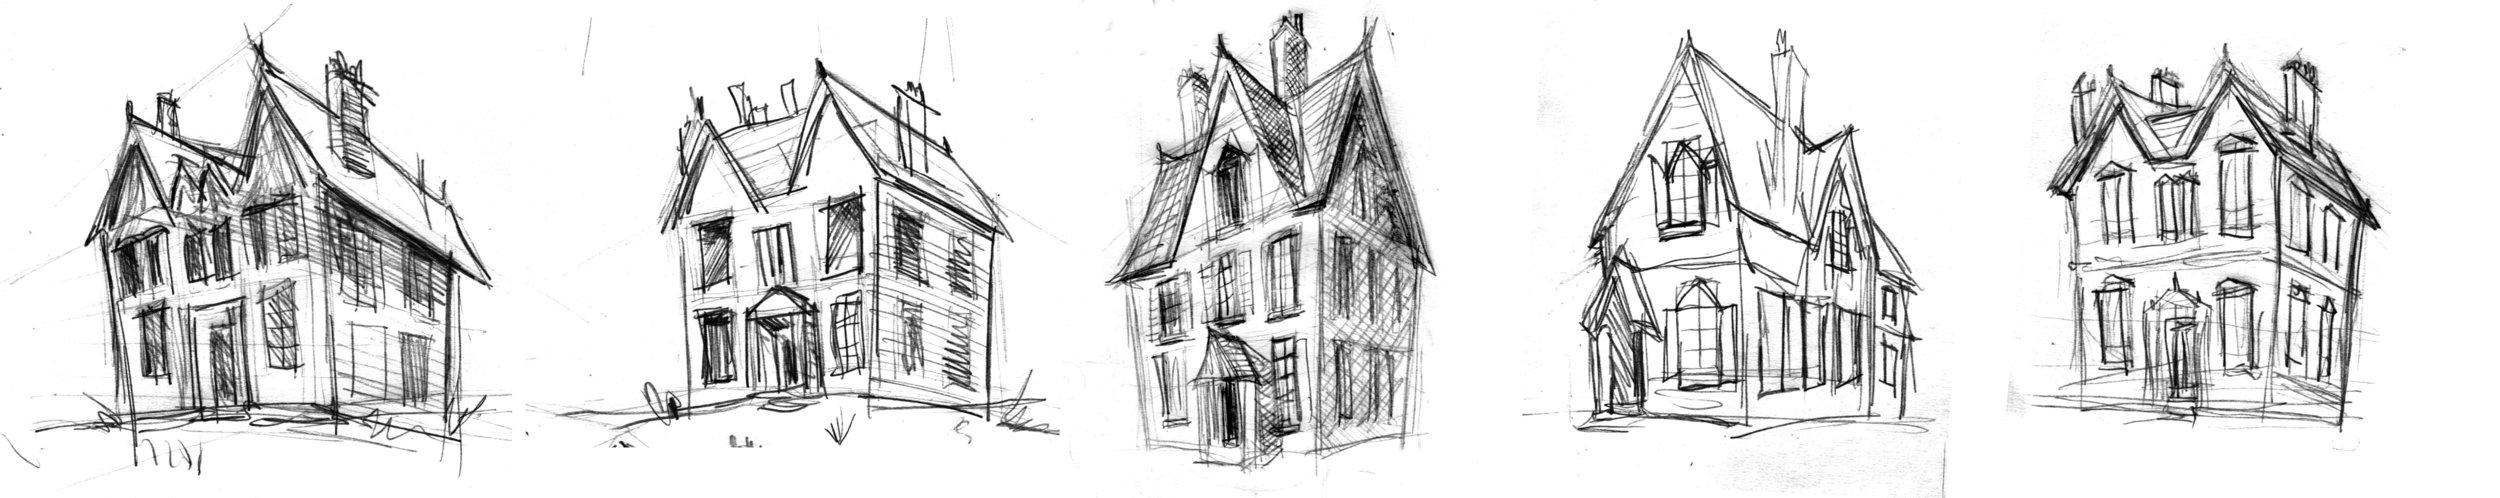 Various house creepy house options.